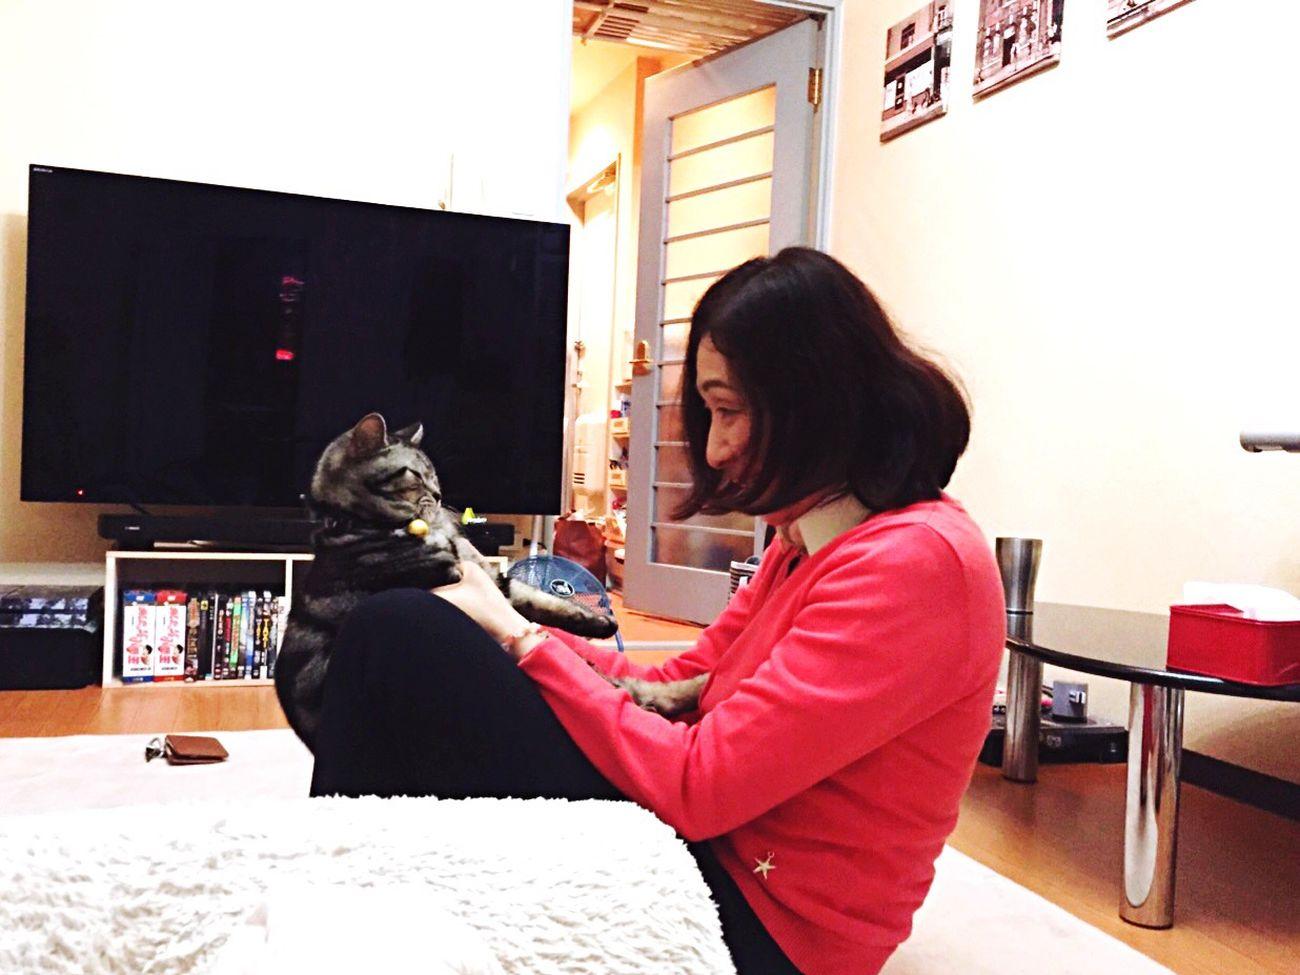 Two Is Better Than One cat & human love cat love animal harmony happy wonderful family joy abundance light No animals no life Brightness Is Myfuture